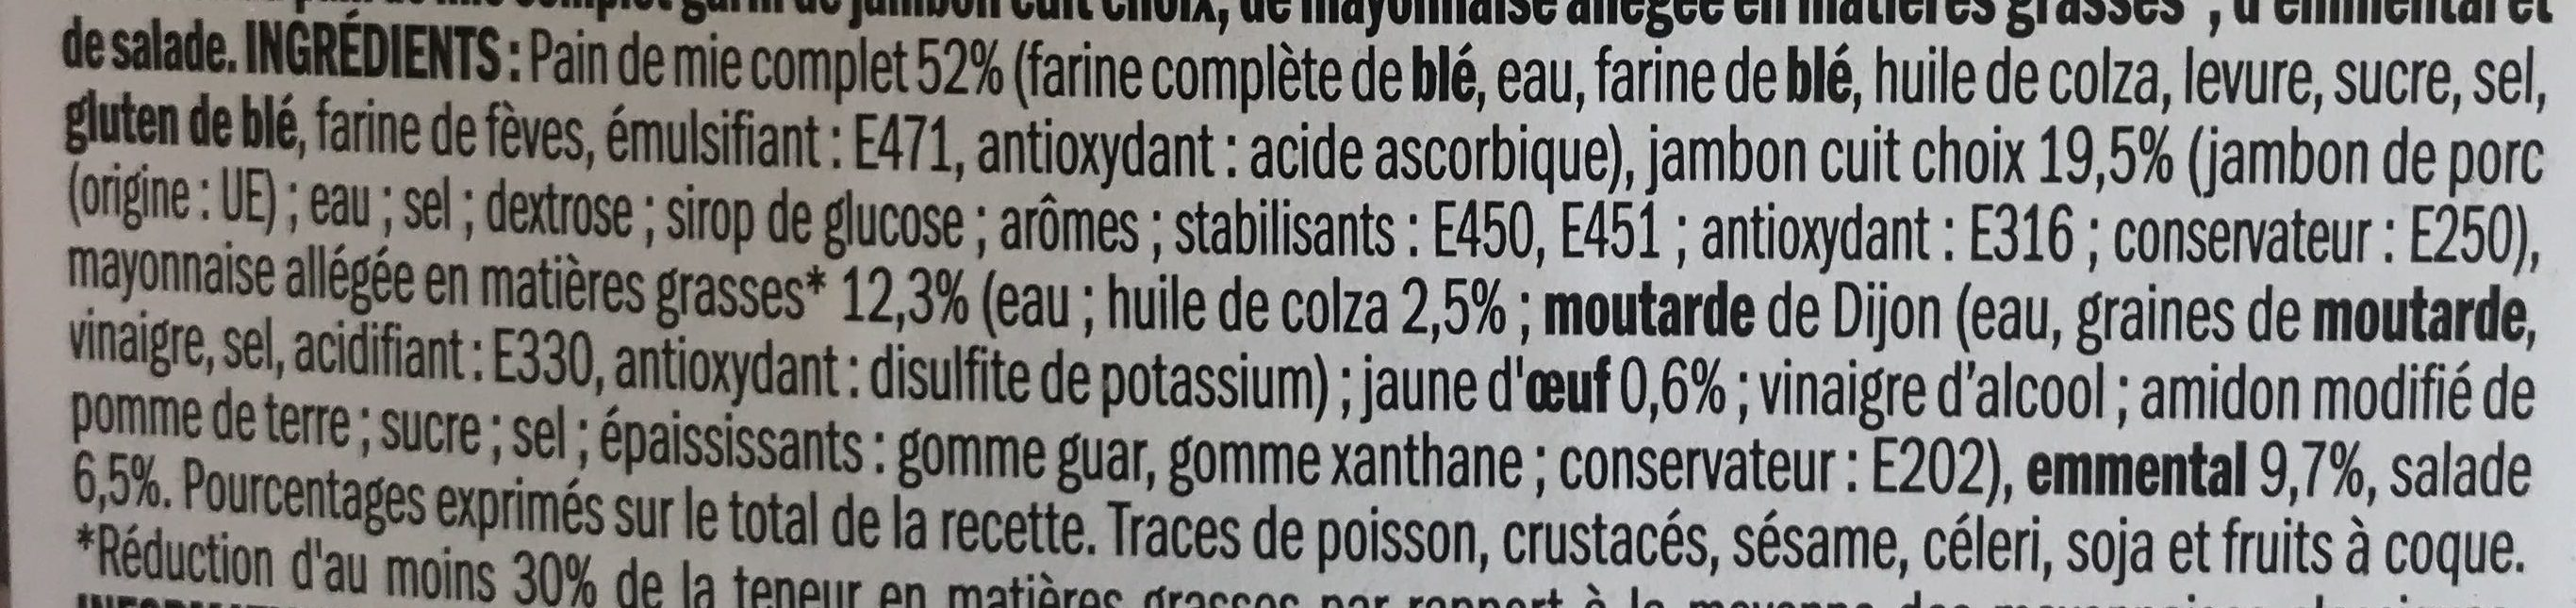 Sandwich club triple jambon emmental salade - Ingredients